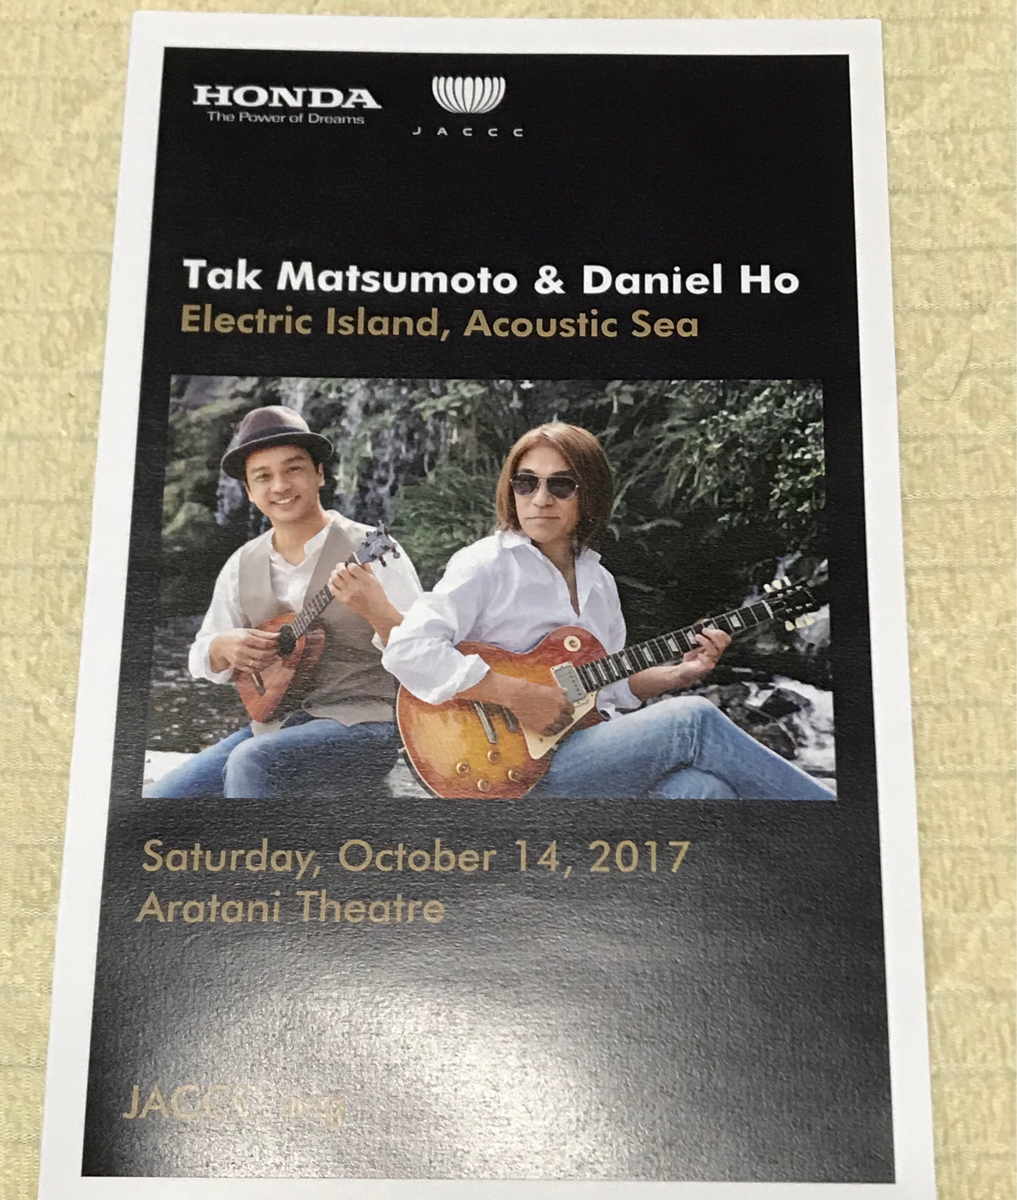 Tak Matsumoto & Daniel Ho ロサンゼルス公演リーフレット